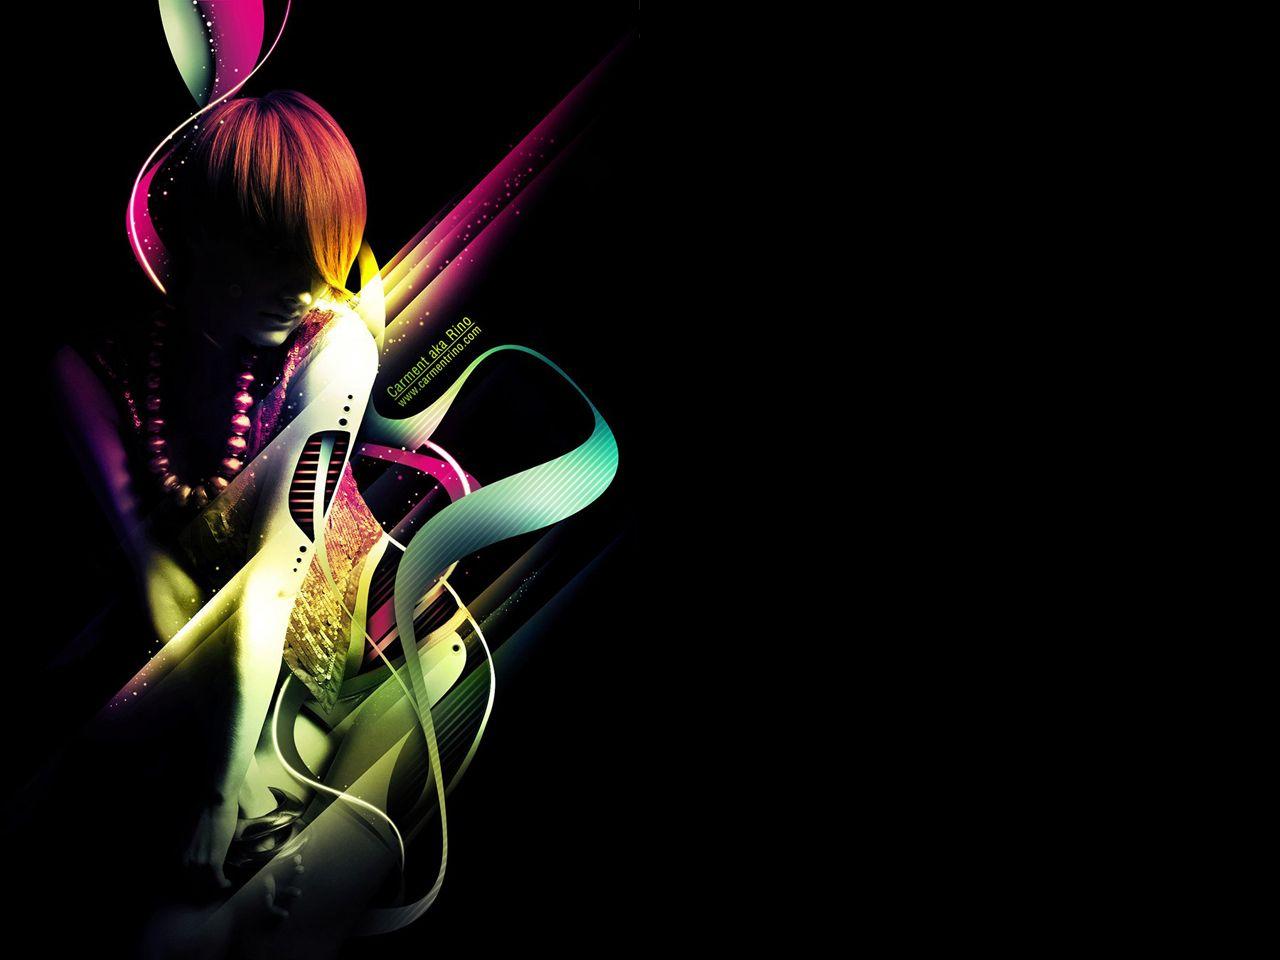 http://2.bp.blogspot.com/-hcDYF0Y9X7o/T4TINDoTUBI/AAAAAAAAAC4/CloRfWswwMU/s1600/colorful-3d-art-wallpaper-gallery-10.jpg